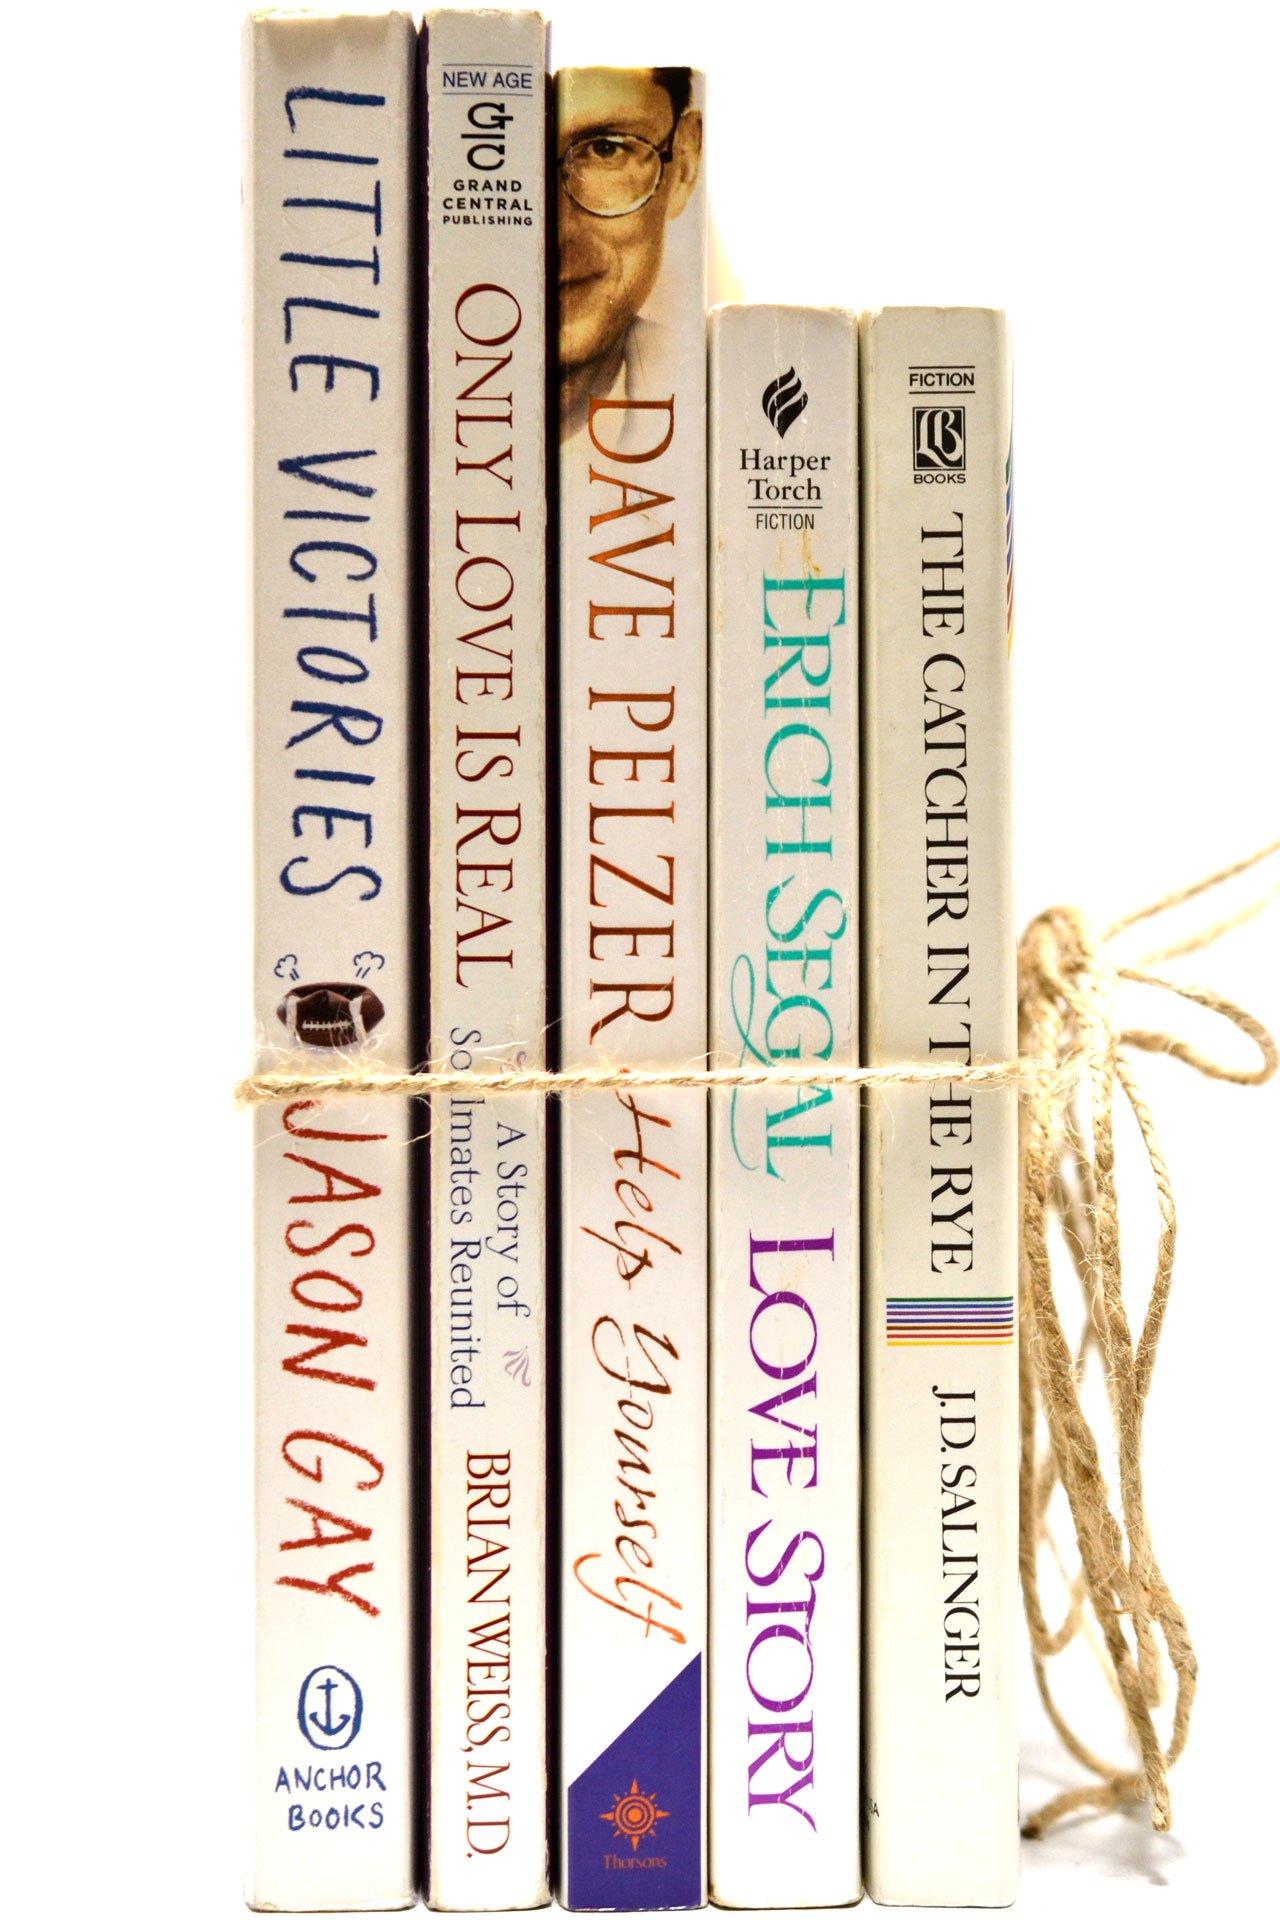 Decorative Books - DAVE PELZER 全5冊